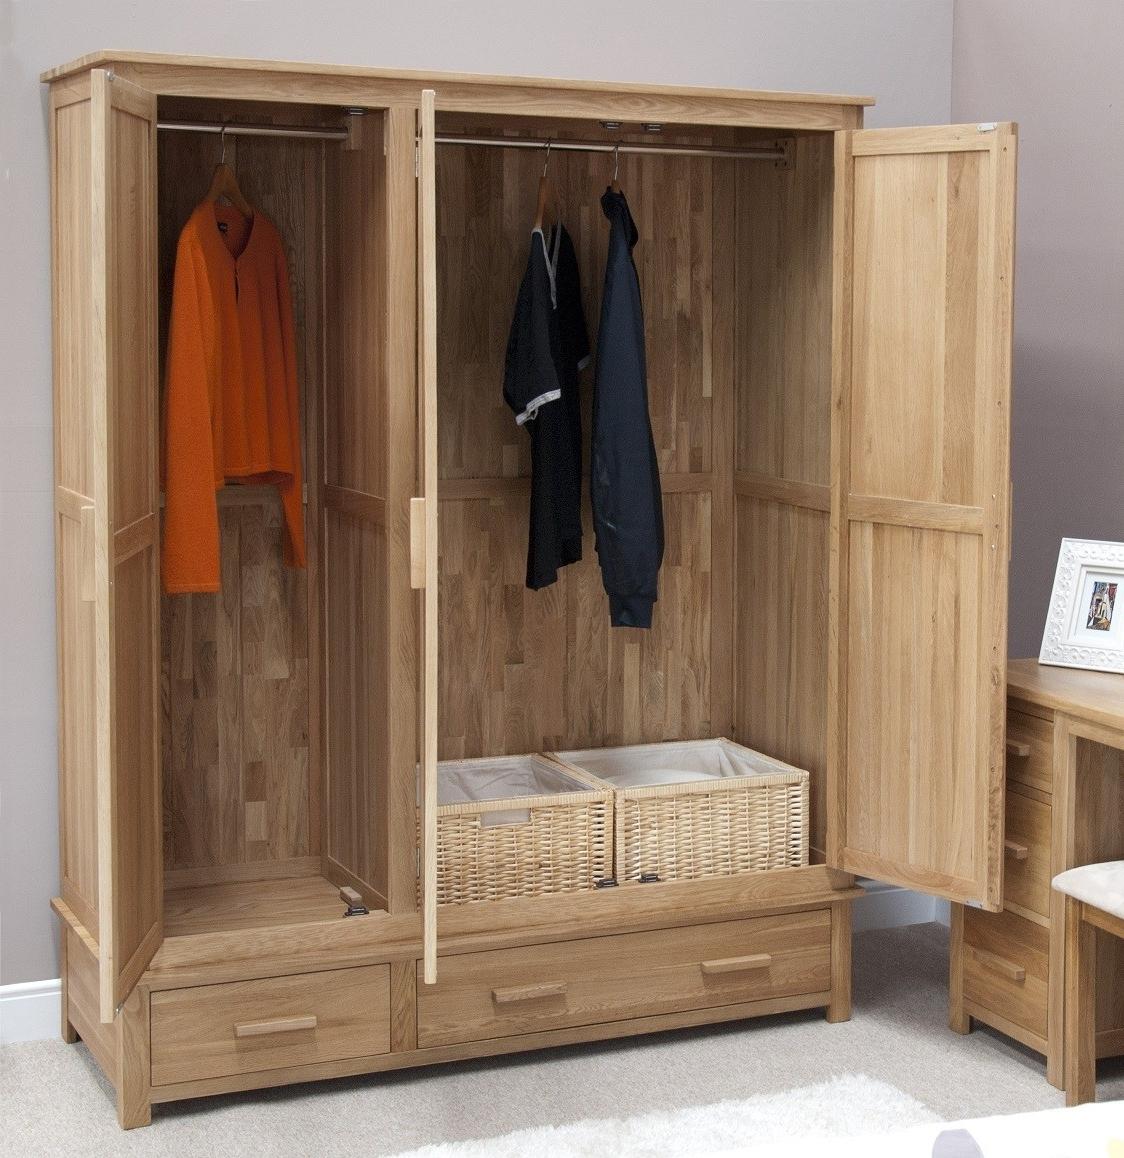 Oak Furniture Uk Throughout Oak 3 Door Wardrobes (View 9 of 15)